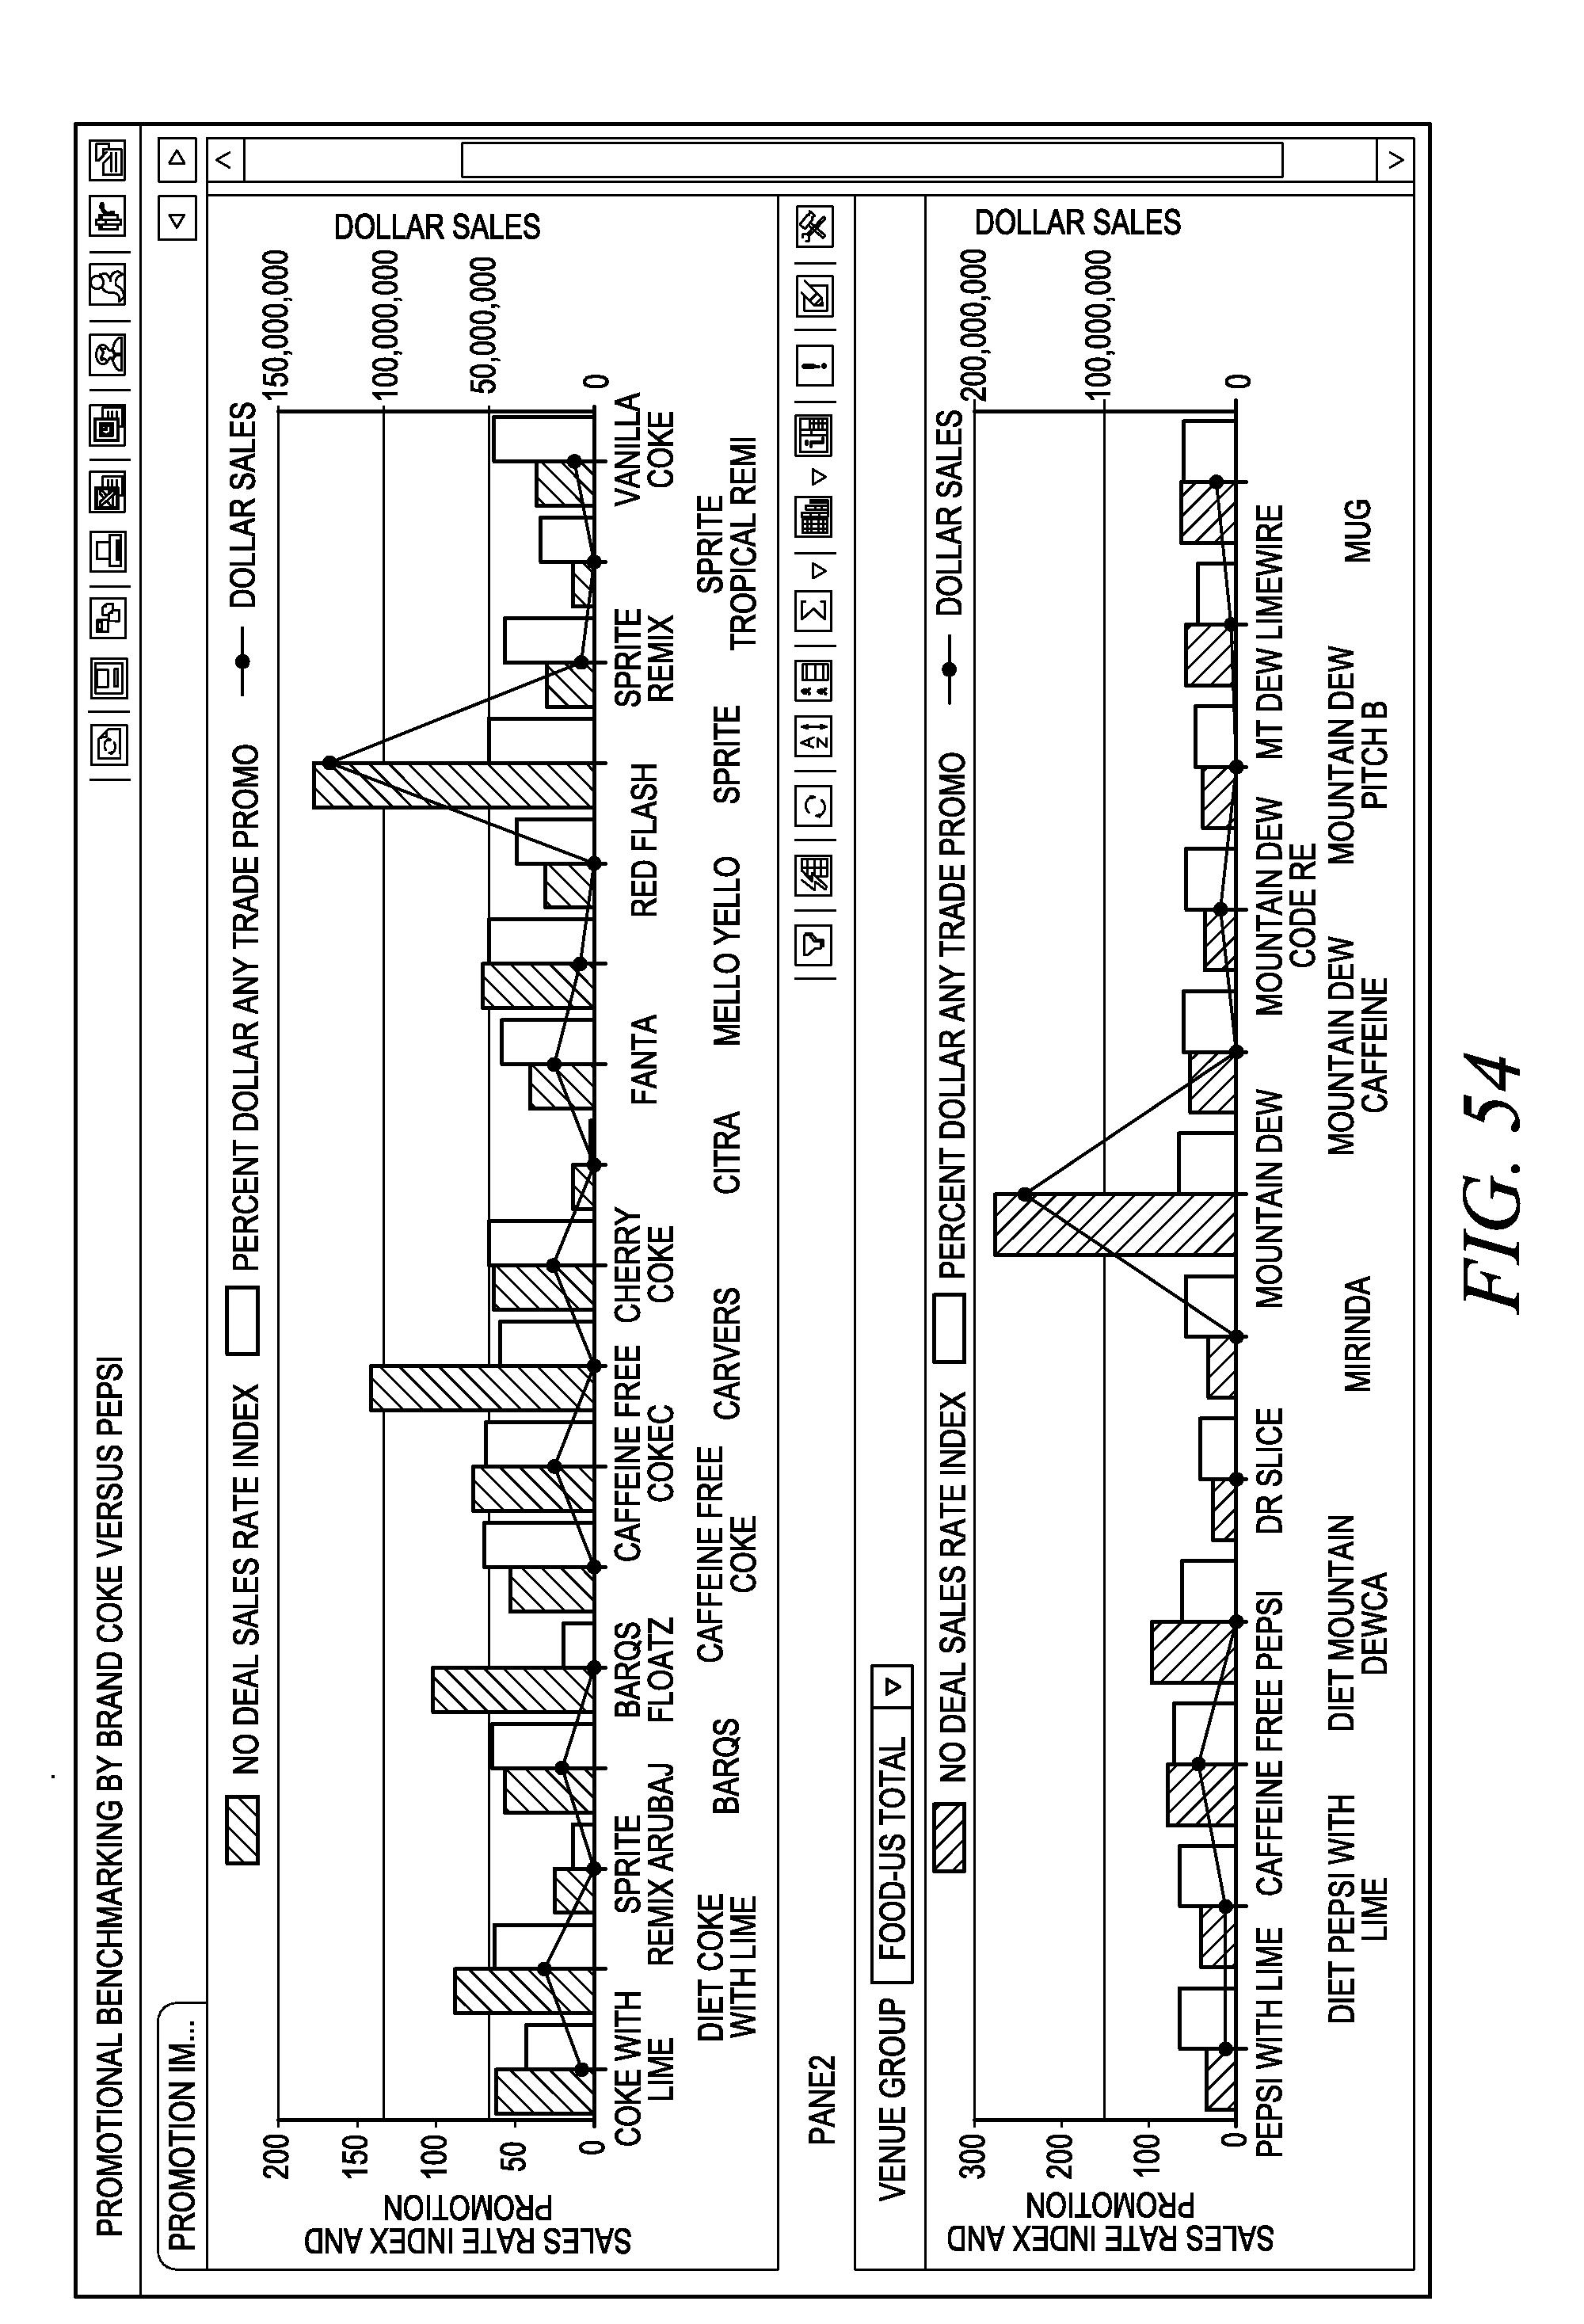 Patent US 20090018996A1